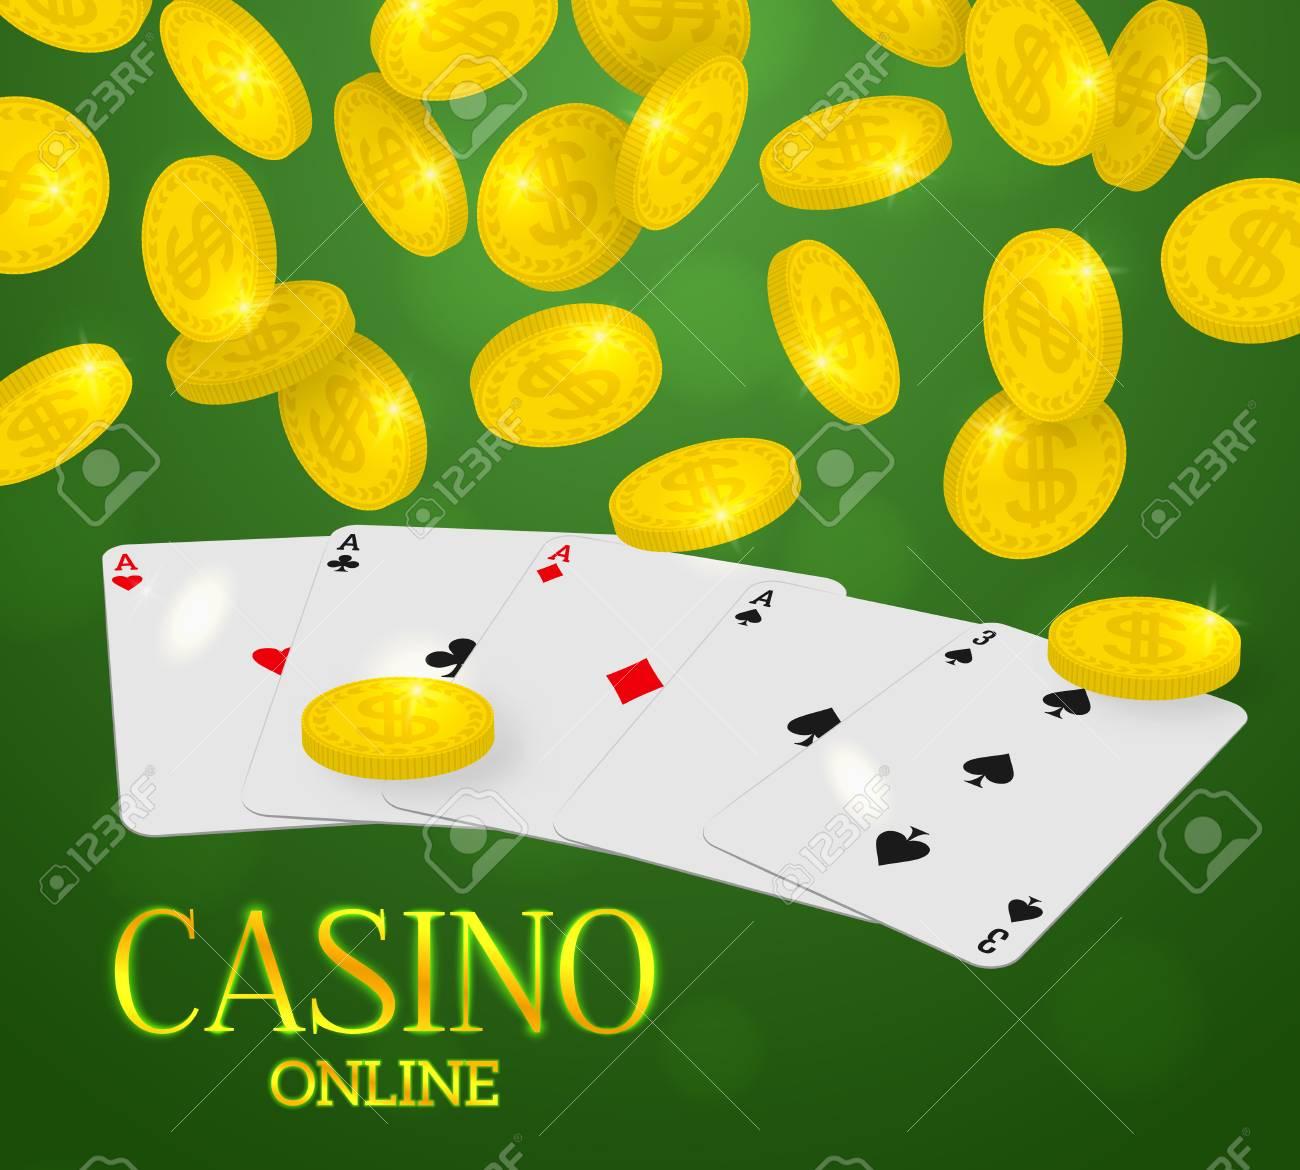 bono gratis para casino sin deposito